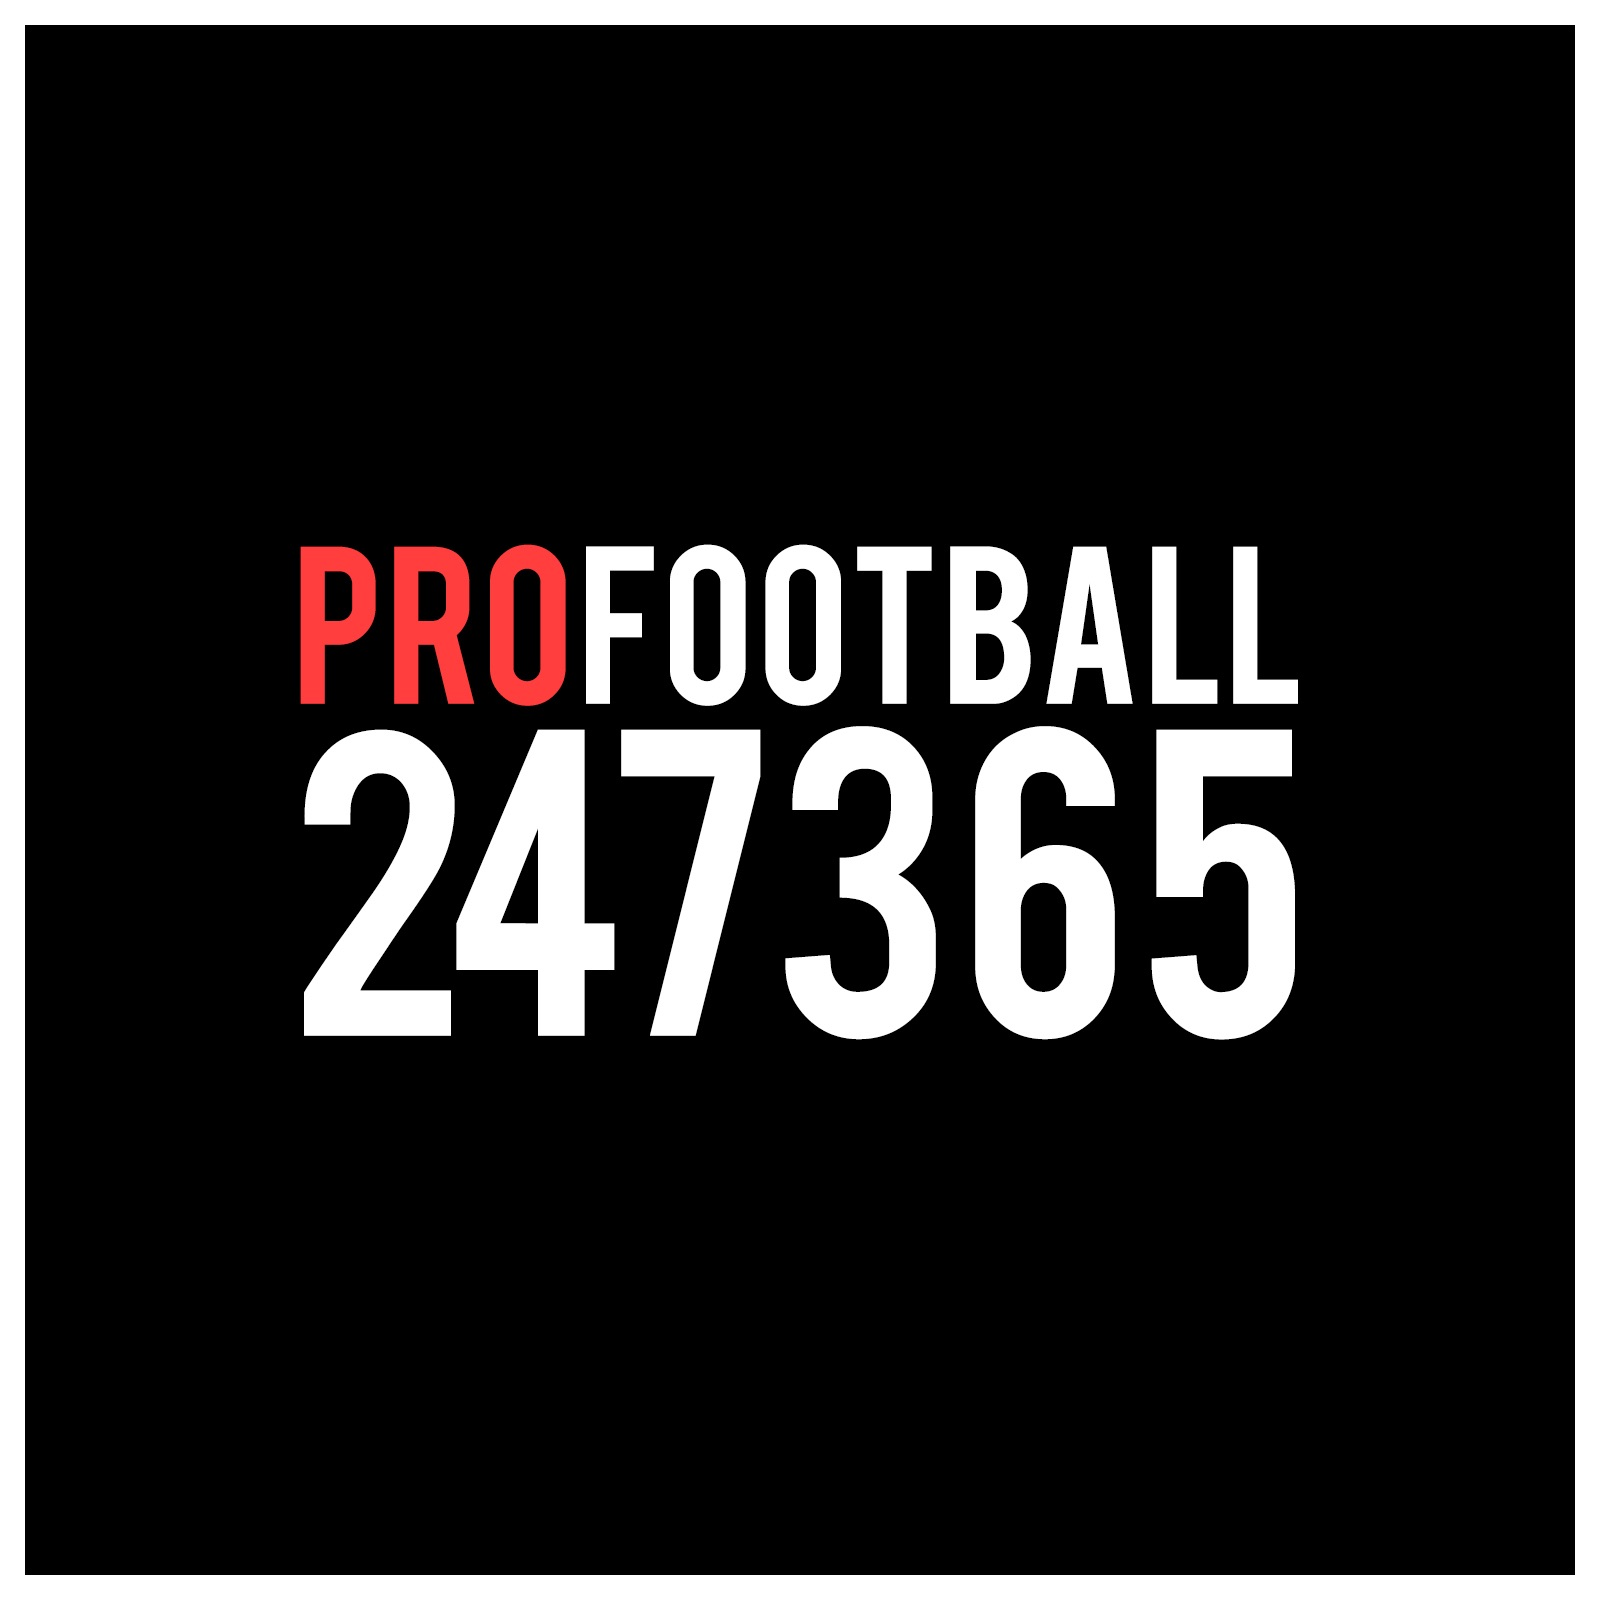 ProFootball247365 Podcast